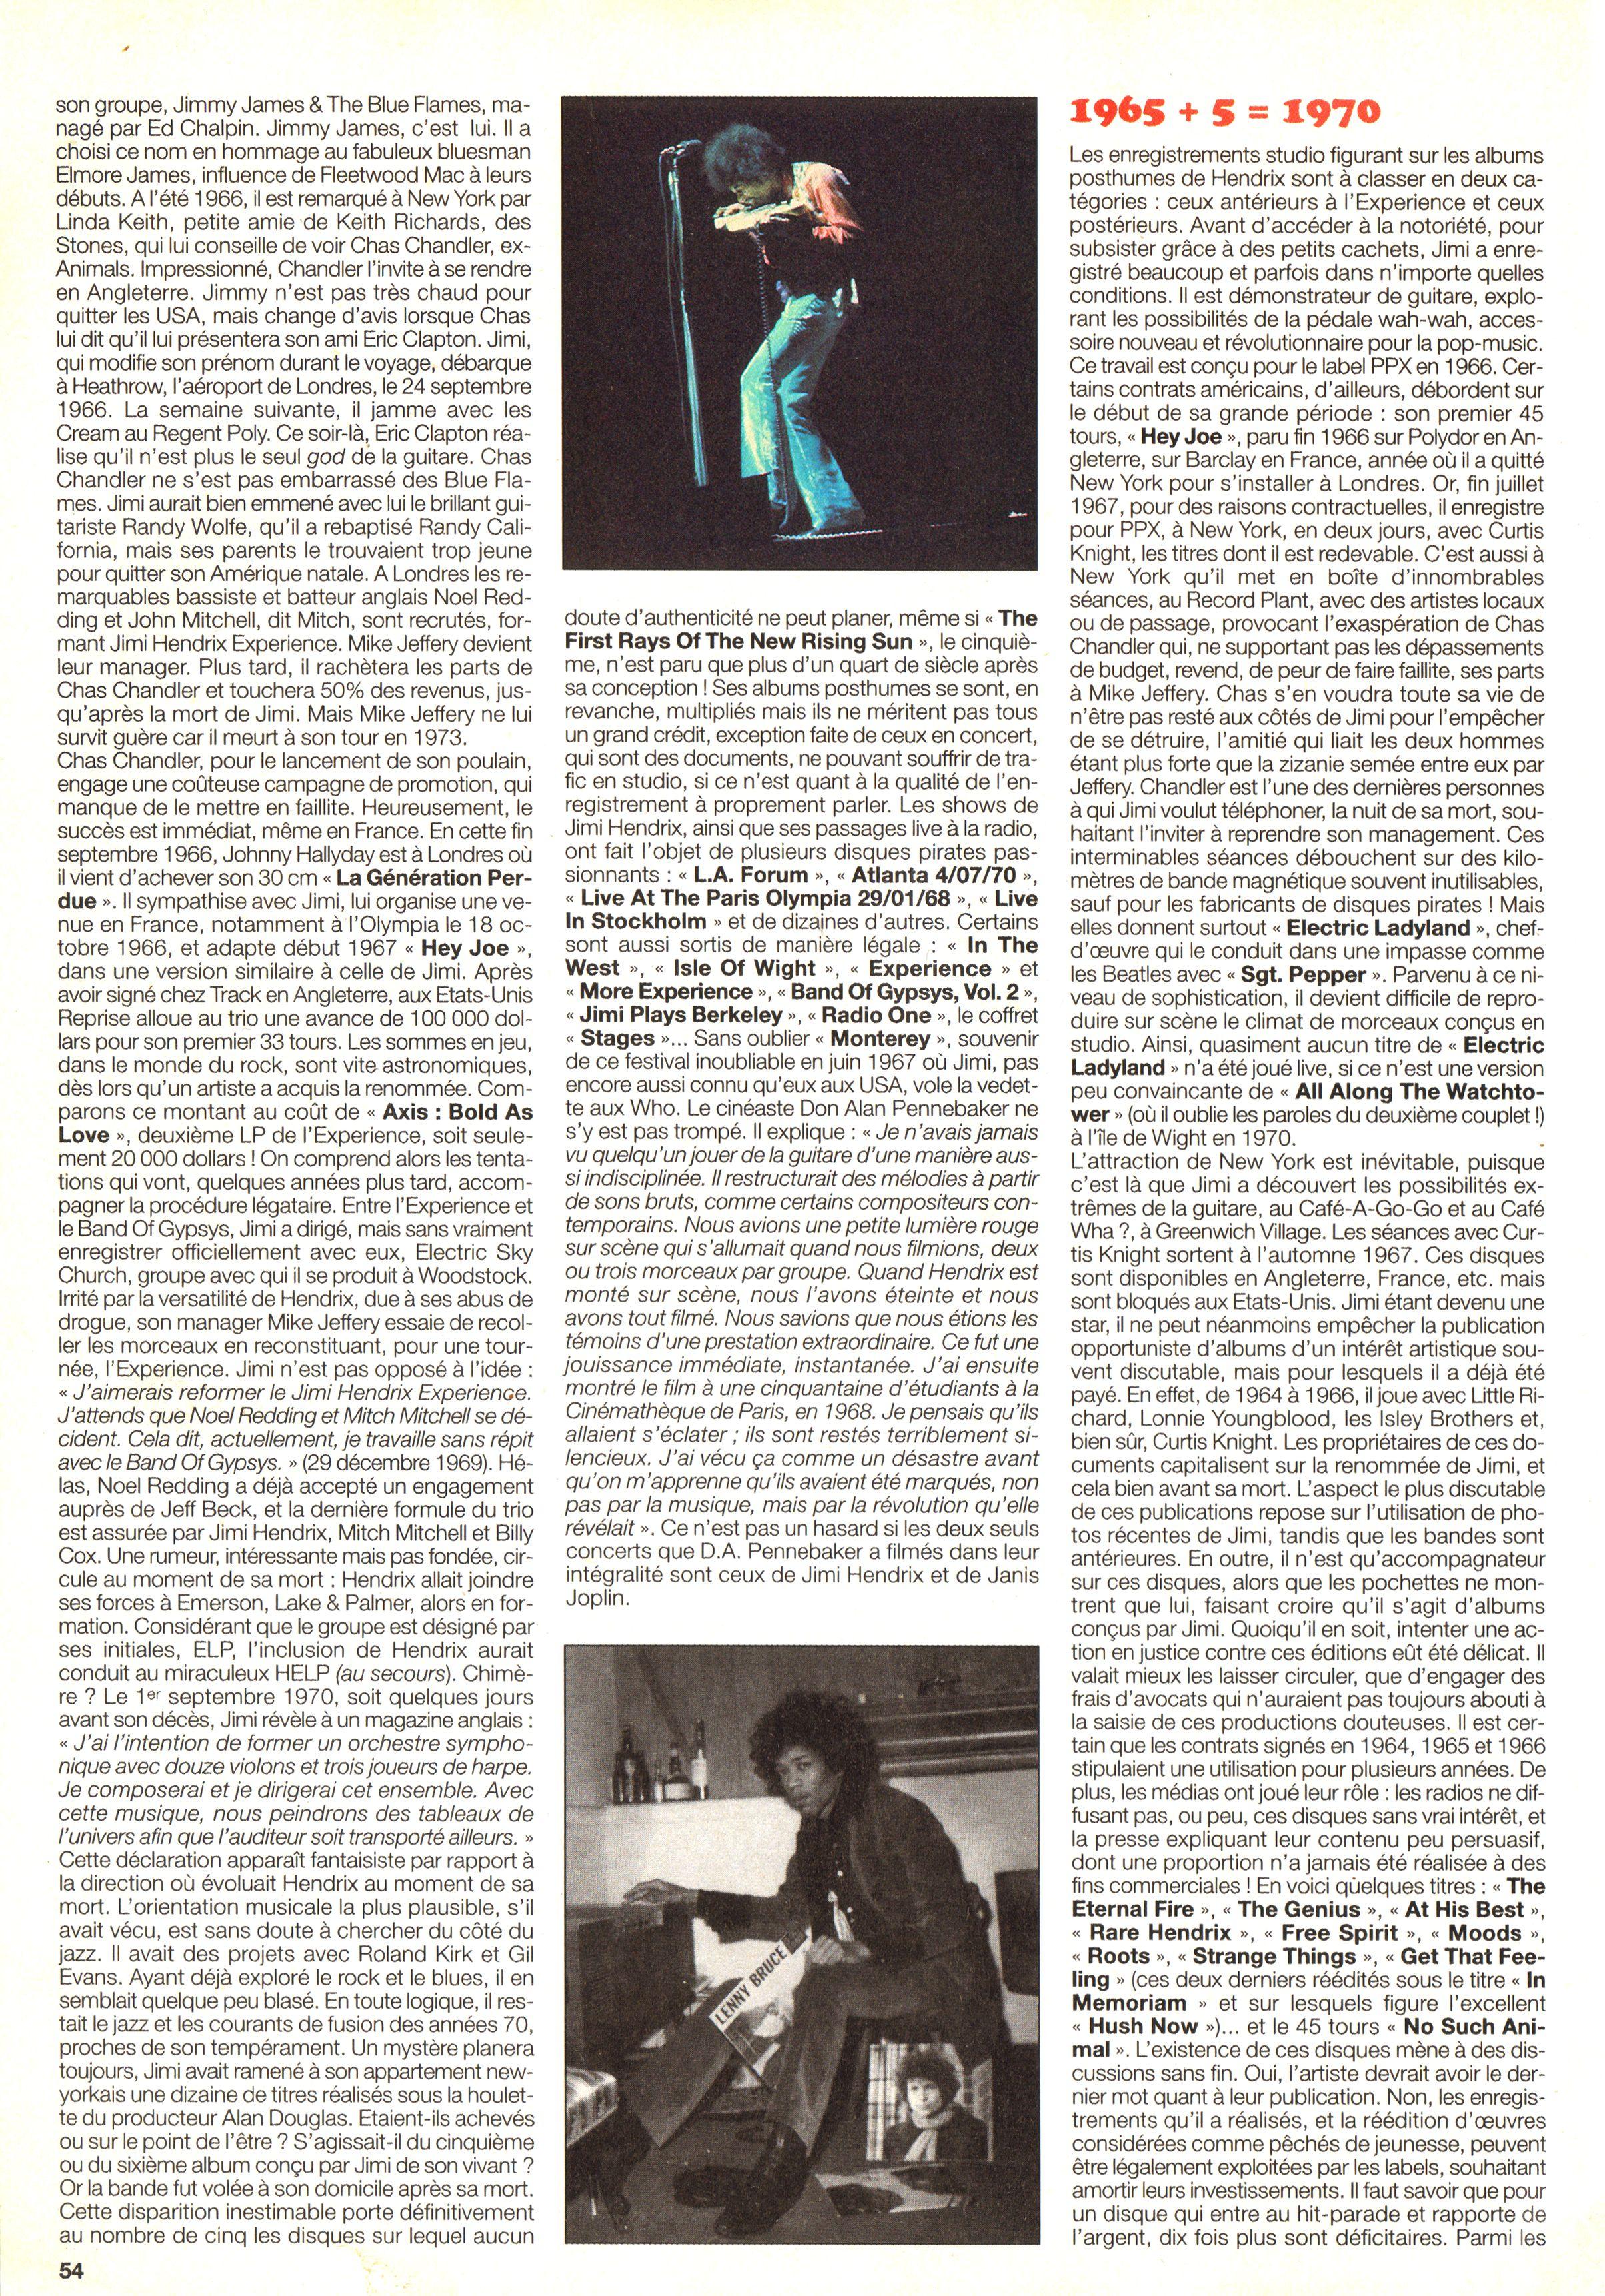 Magazines Français 1989 - 2014 JukeBoxSeptembre2000Page54